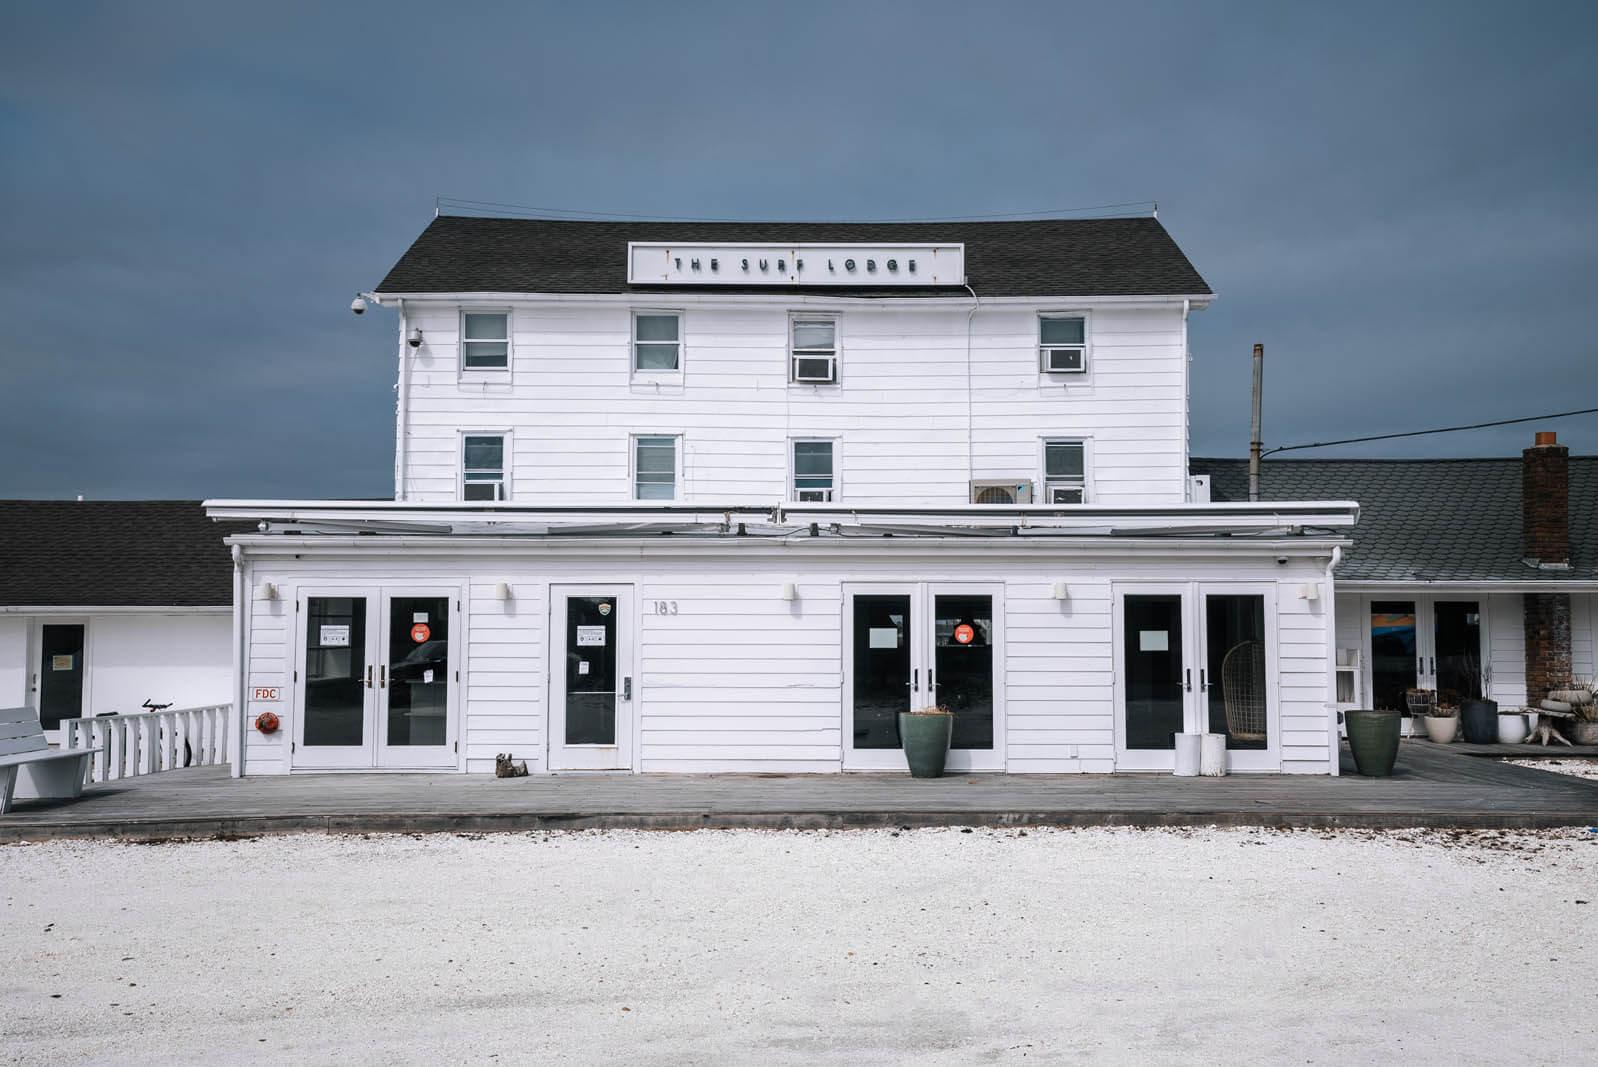 the Surf Lodge in Montauk Hamptons New York